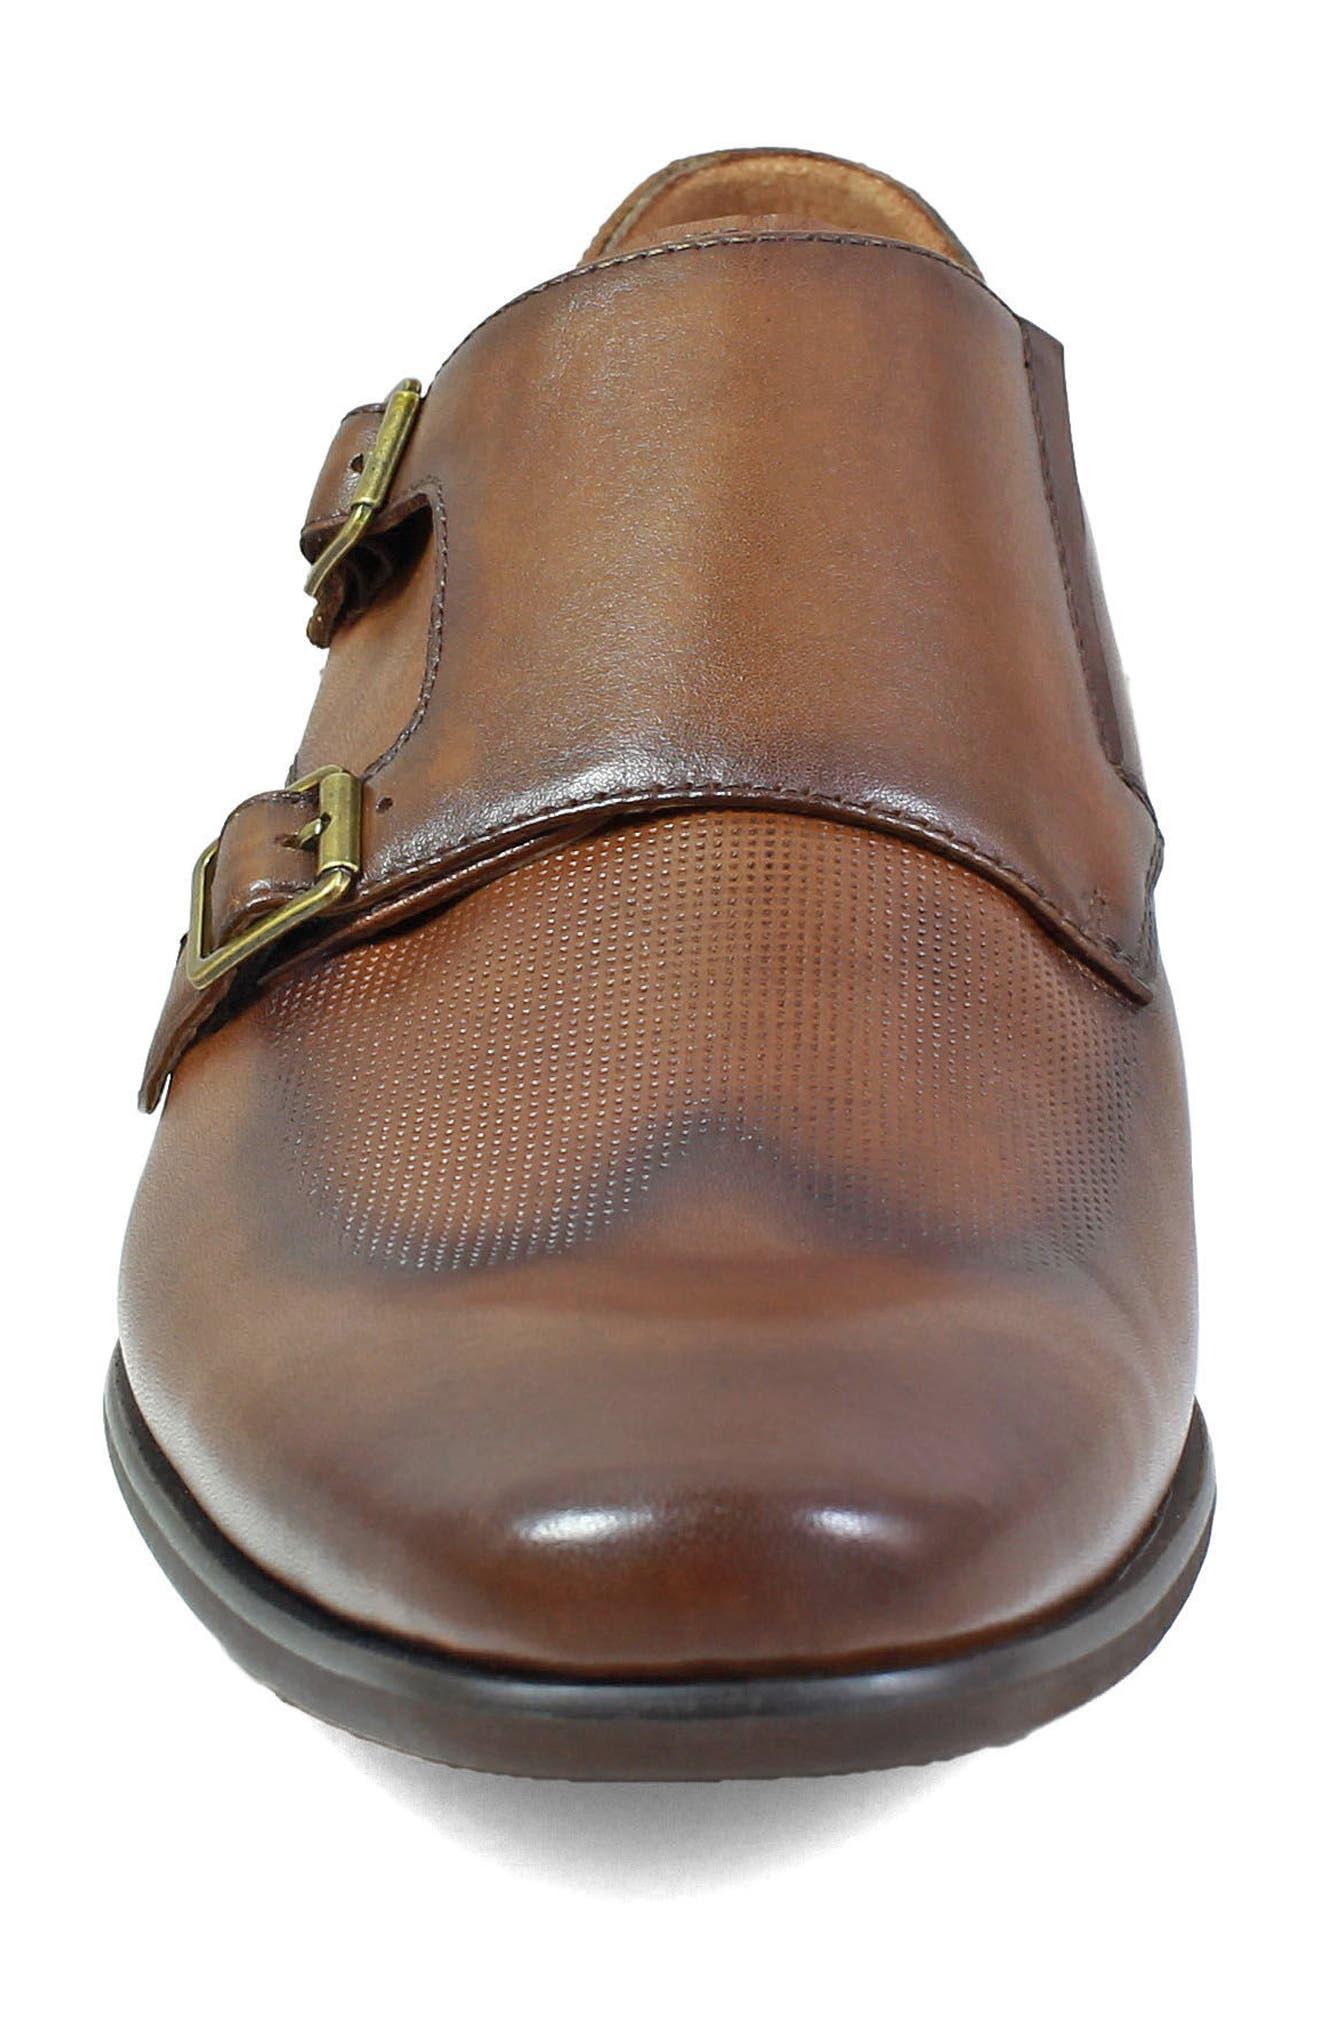 Postino Textured Double Strap Monk Shoe,                             Alternate thumbnail 4, color,                             Cognac Leather